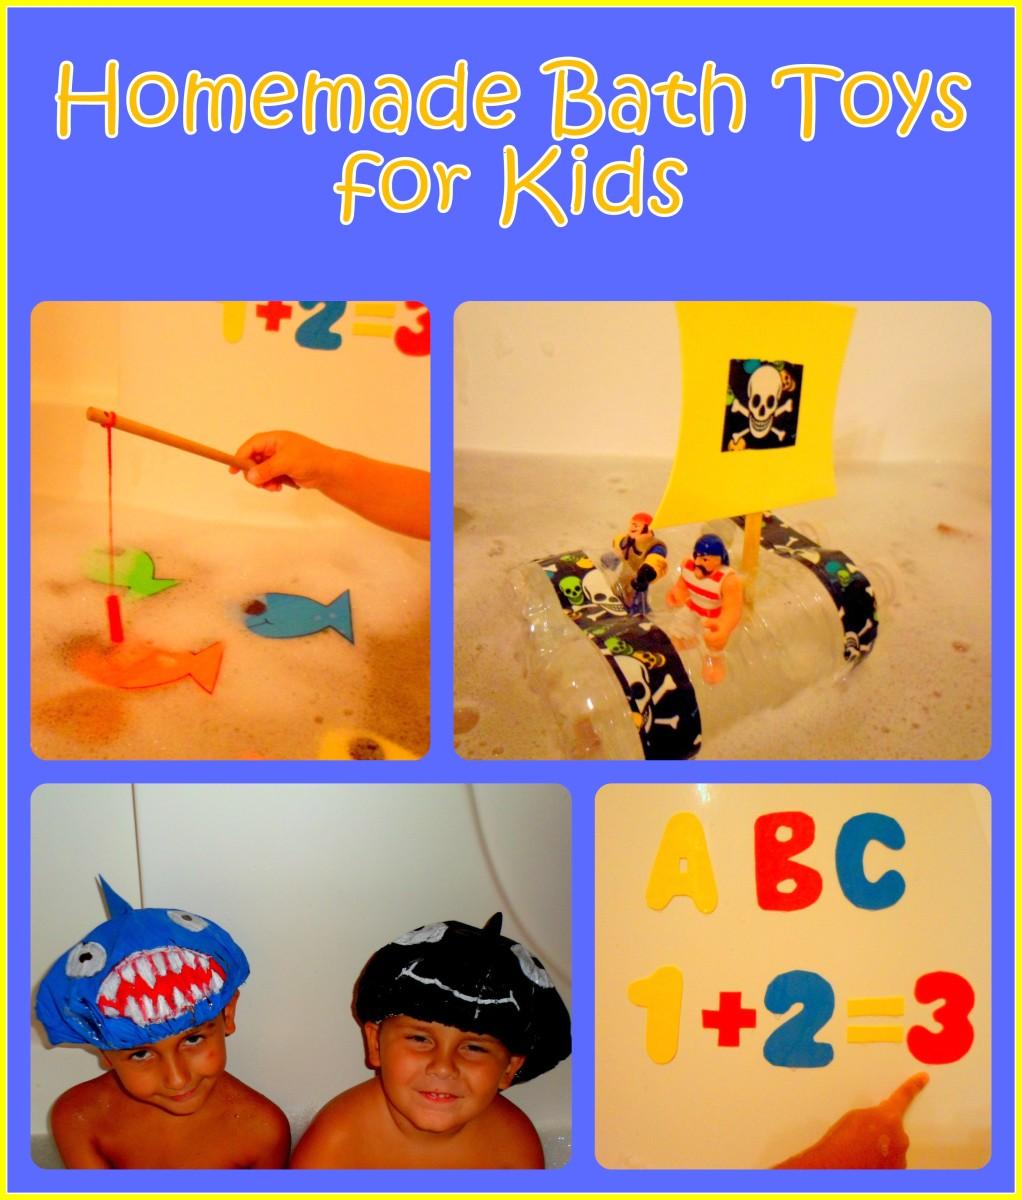 How To Make Homemade Bath Toys For Kids WeHaveKids